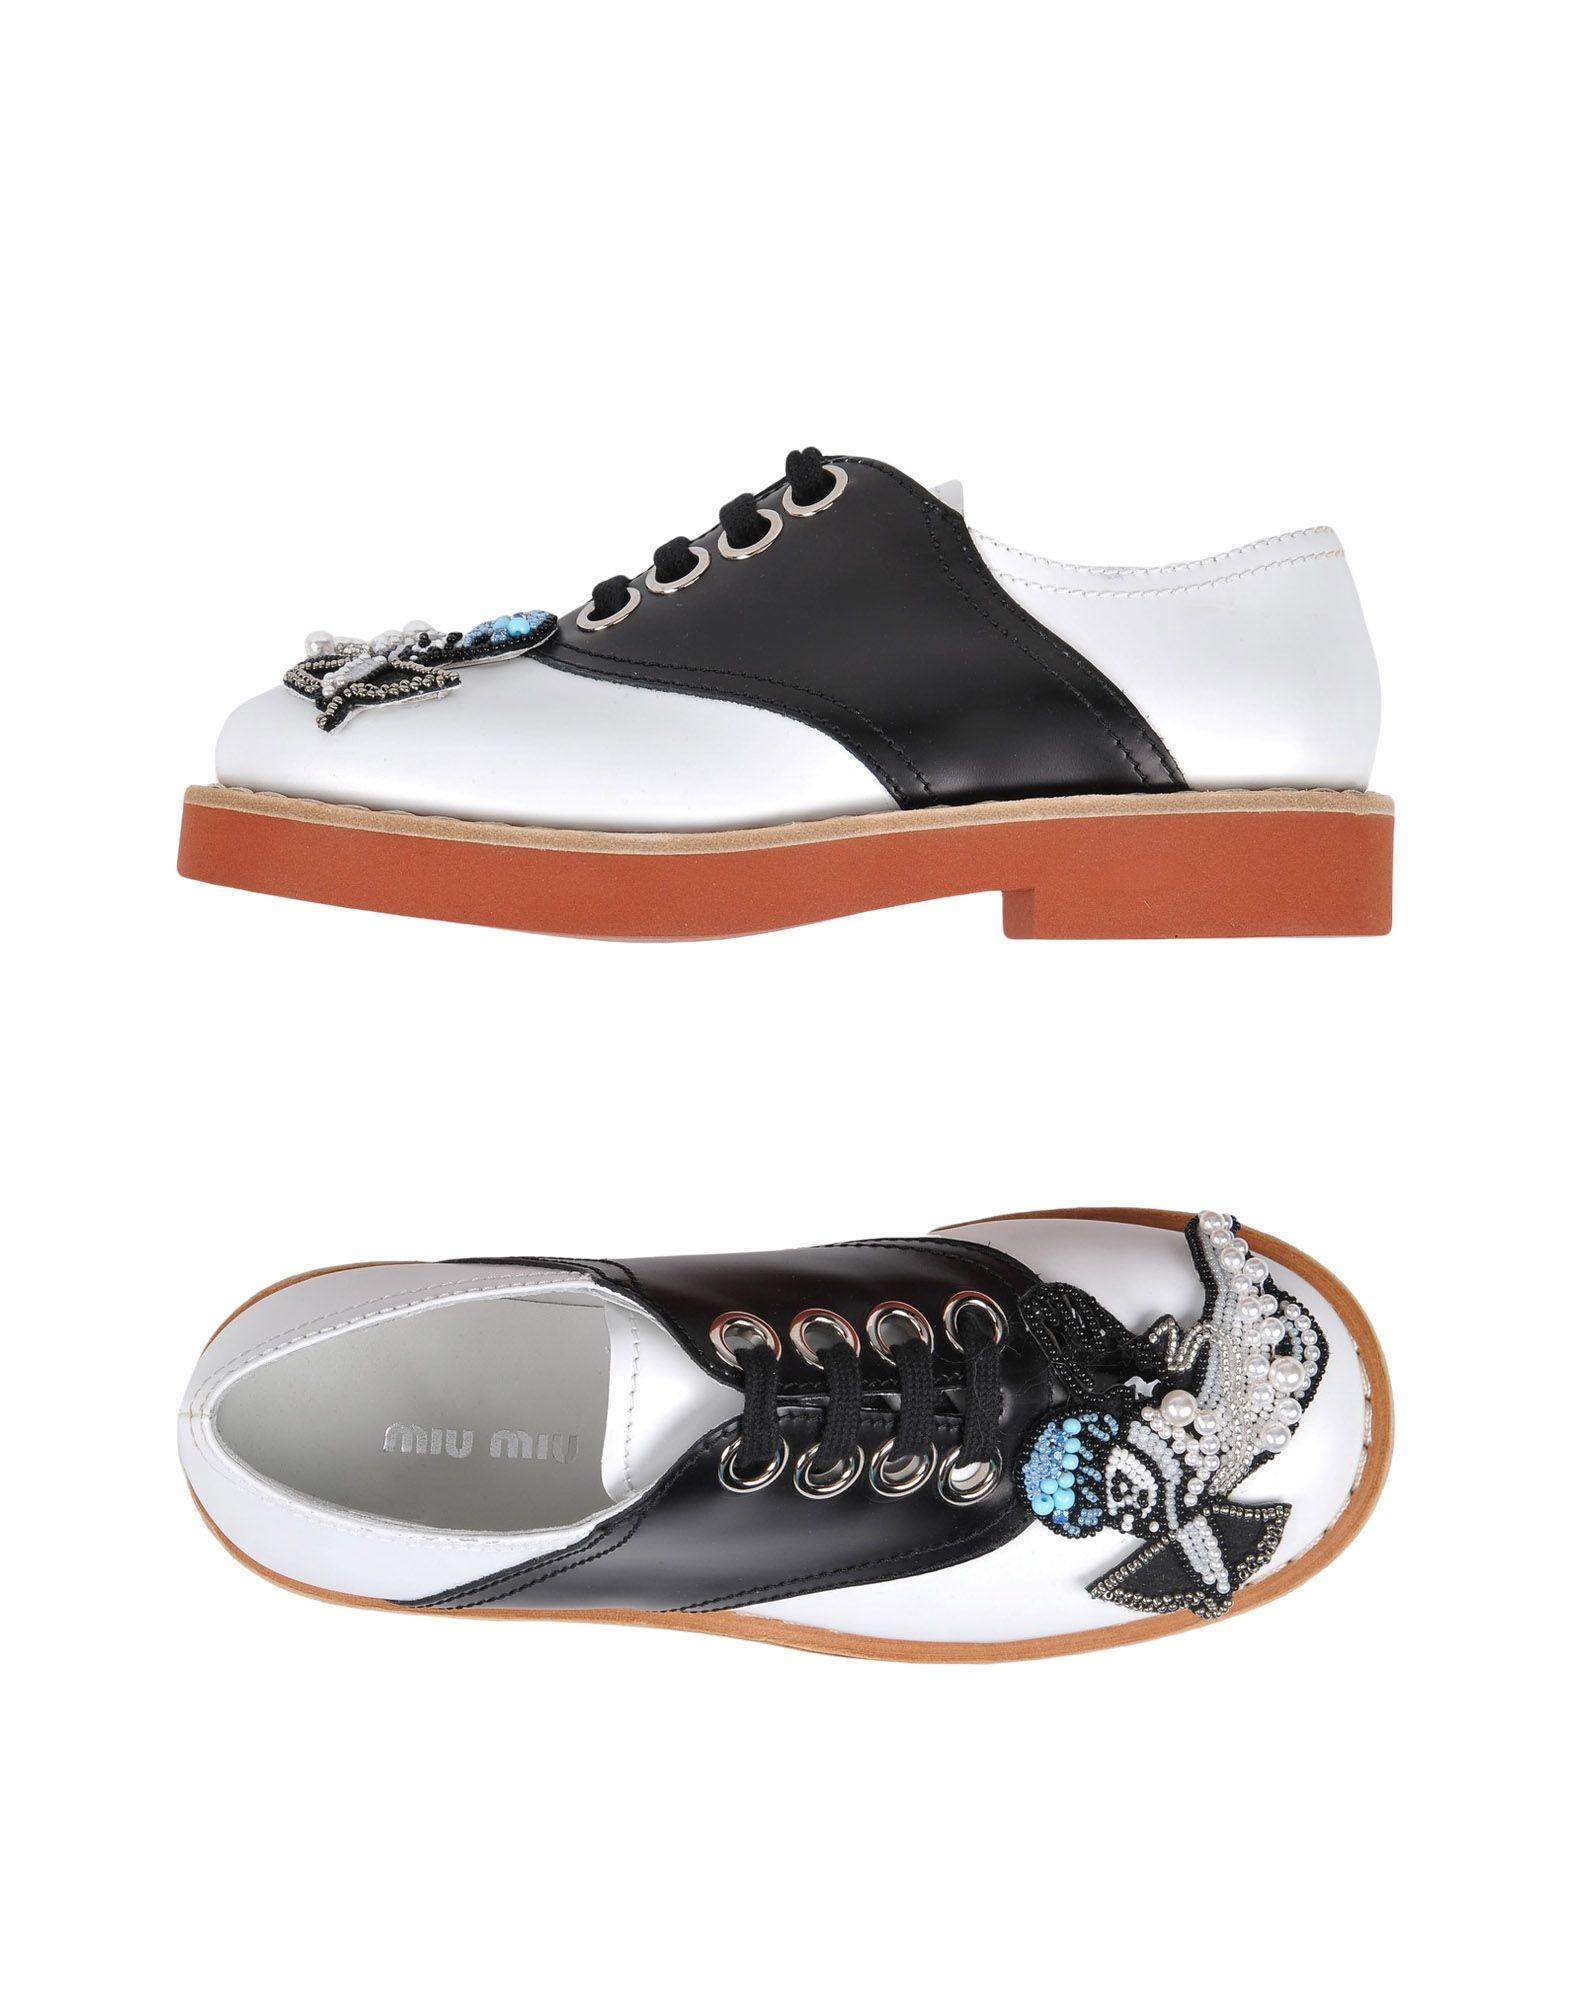 Miu Miu Schnürschuhe Damen  11484407SMGünstige gut aussehende Schuhe